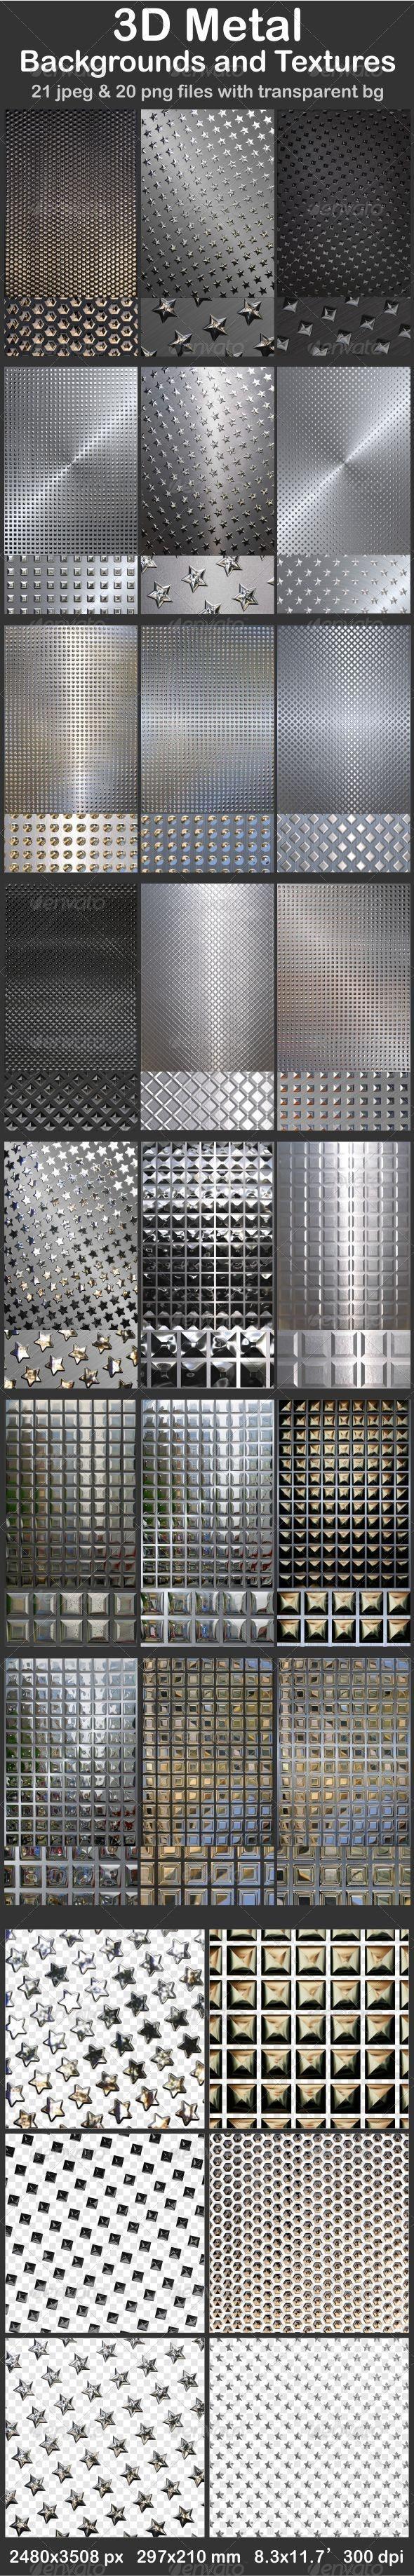 3D Metal Backgrounds and Textures - Metal Textures